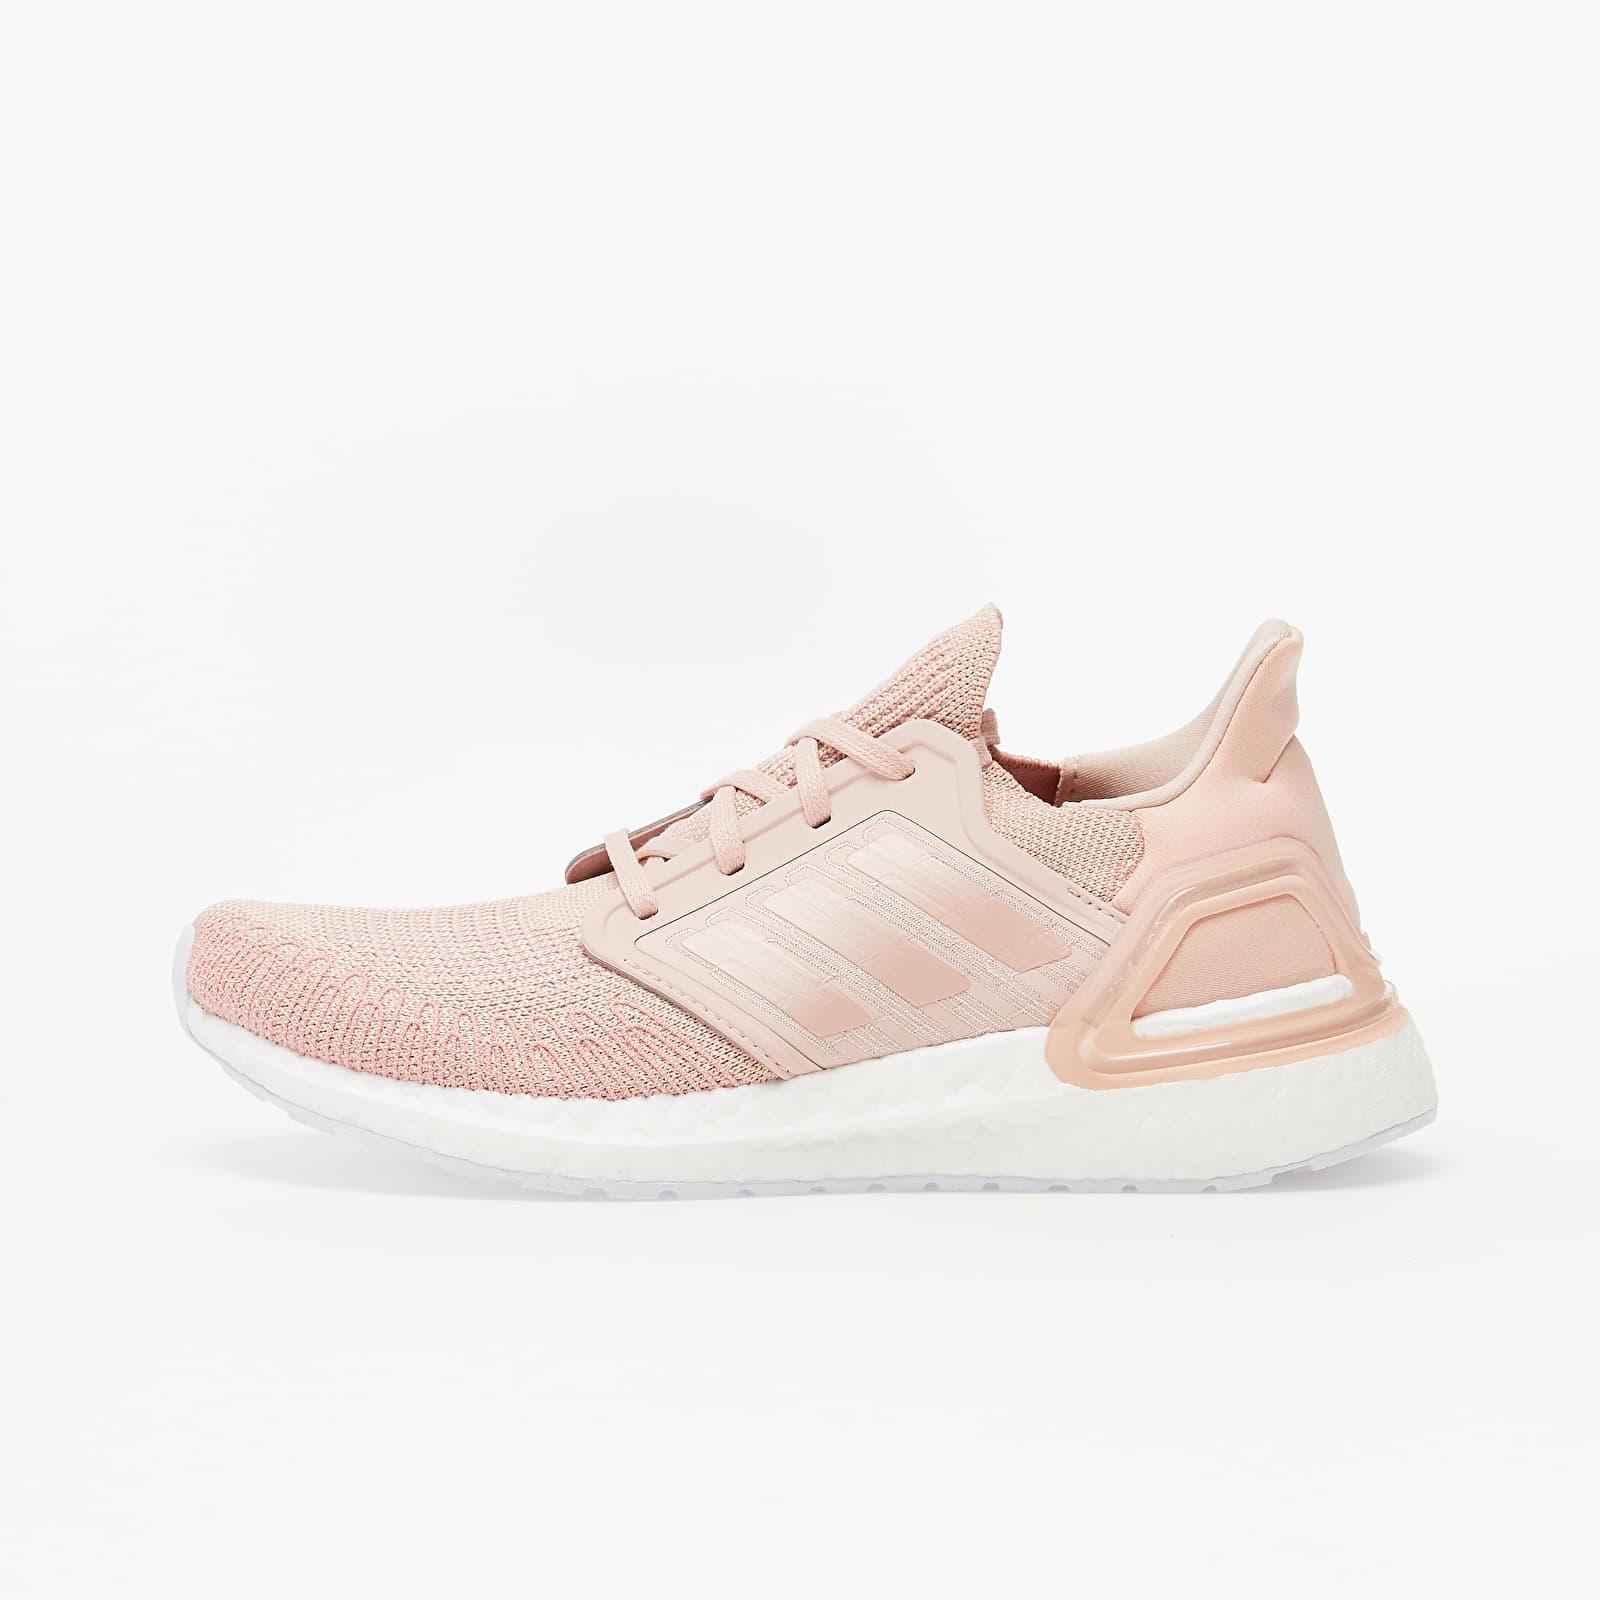 Dámské tenisky a boty adidas UltraBOOST 20 W Vapour Pink/ Vapour Pink/ Ftw White